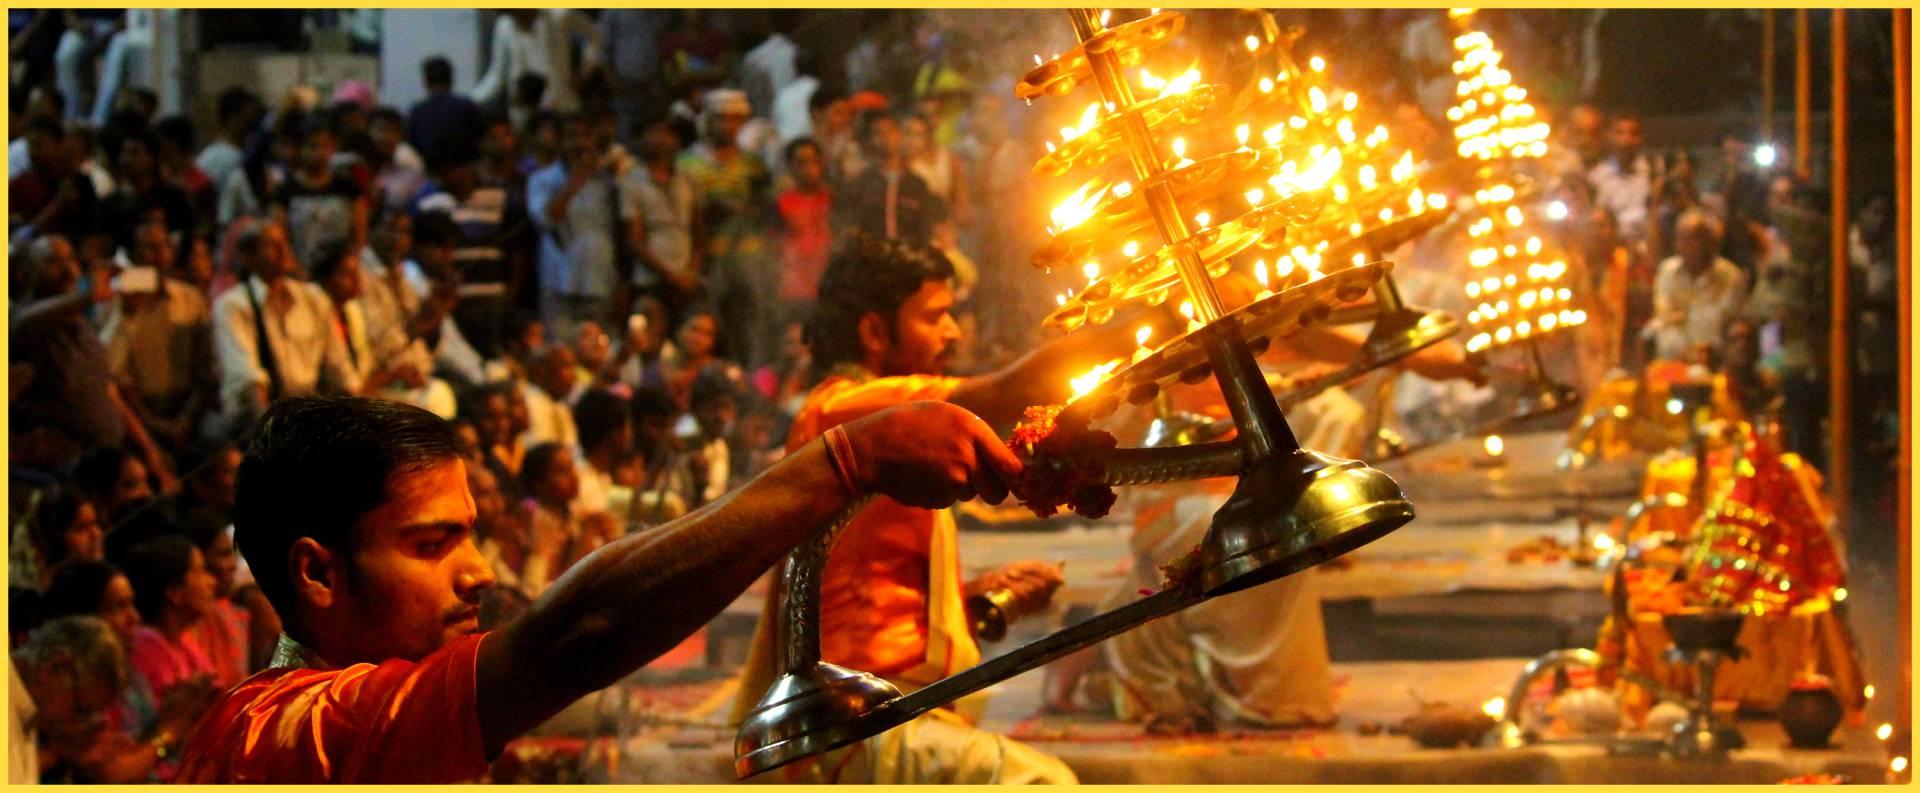 Varanasi- Threads Of Light Image